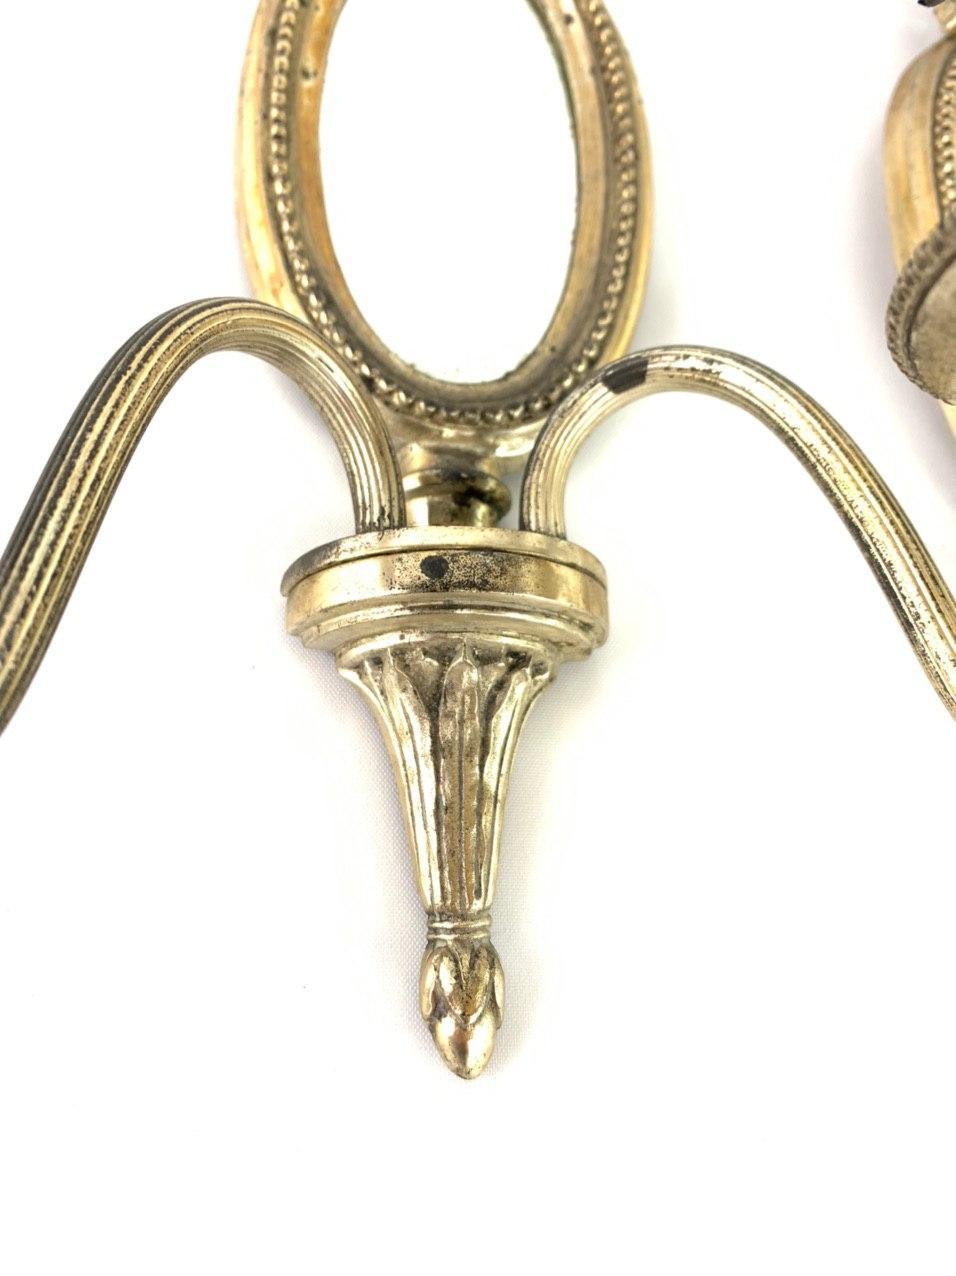 Антикварные бра в стиле Луи XVI